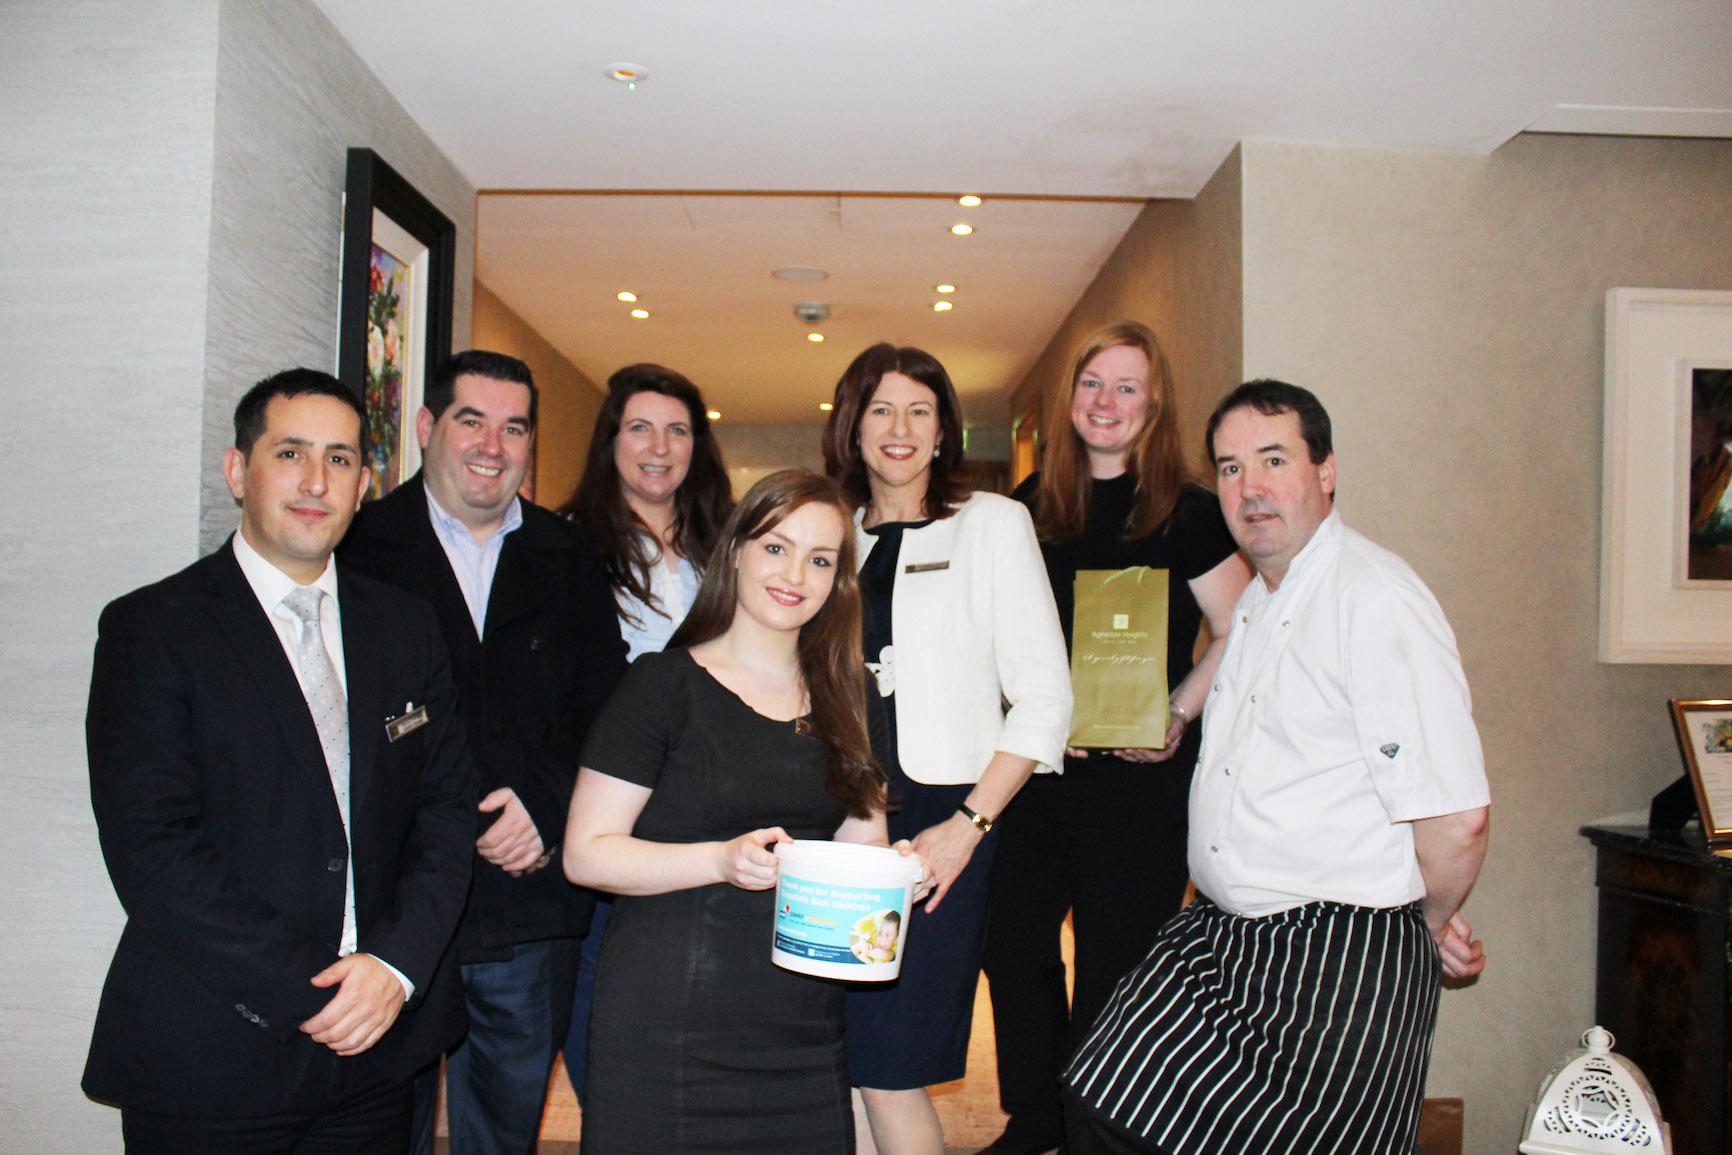 David O'Brien, PJ O'Sullivan, Aunty Nelly's Sweet Shop, Ramona Keogh, Claire Enright and Geraldine Dolan, Aghadoe Heights Hotel & Spa, Patricia O'Brien and head chef Will Fitzgerald.